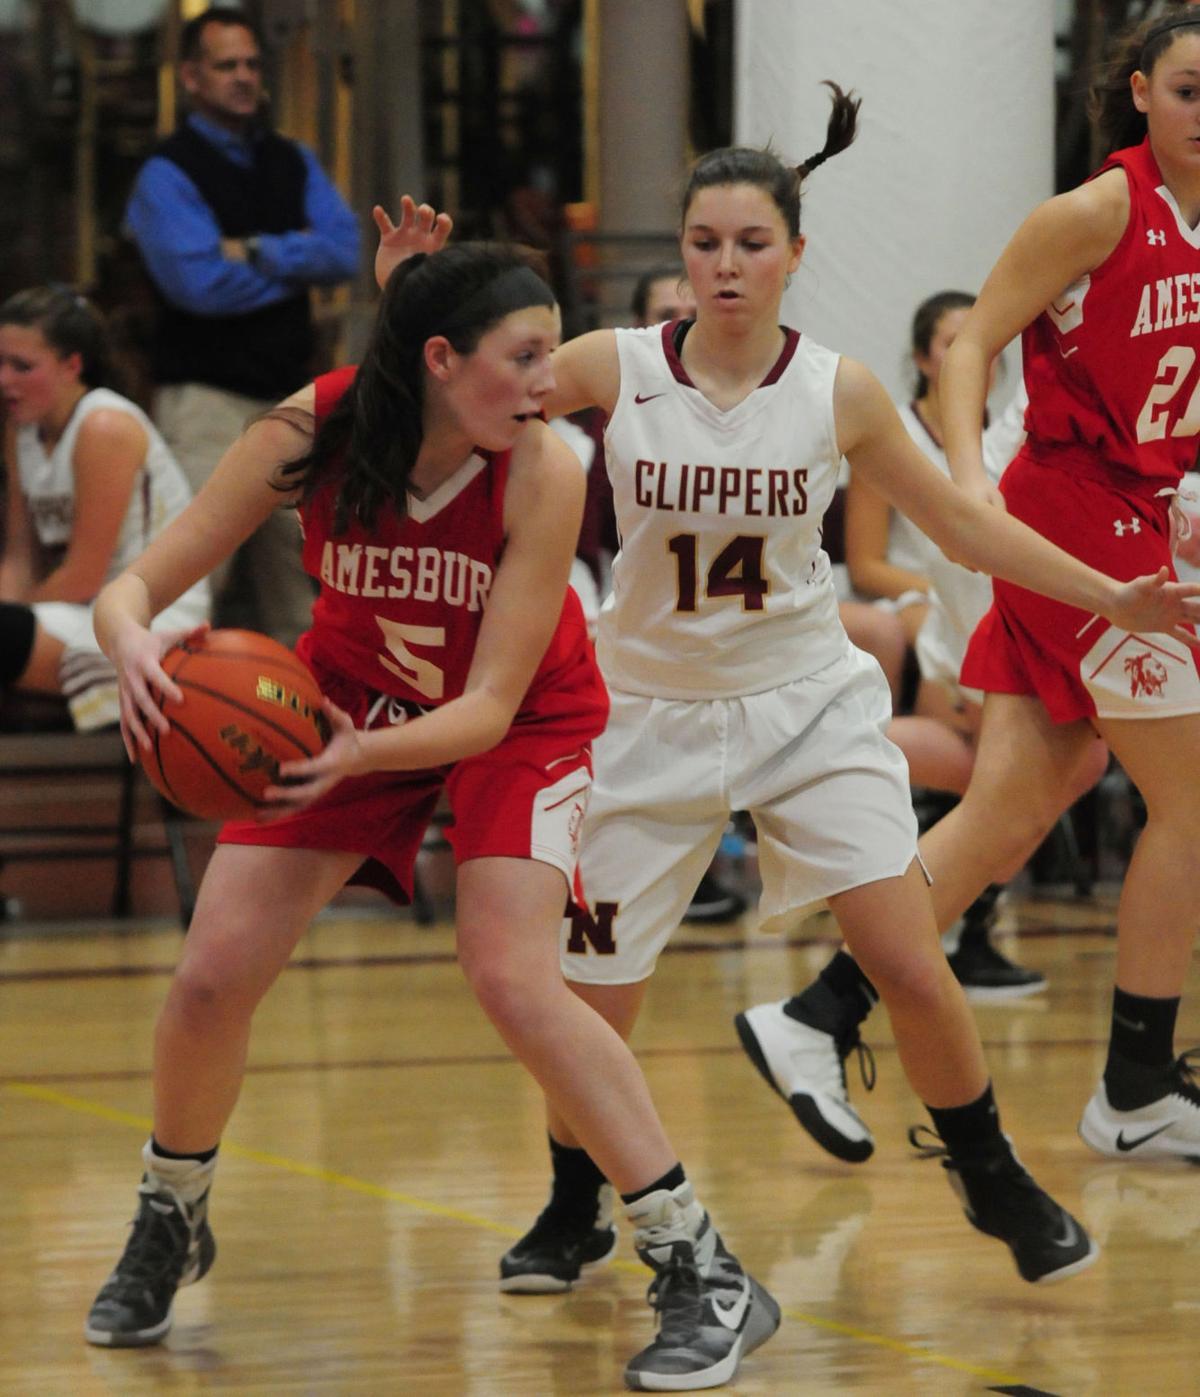 amesbury girls Posts about amesbury high school girls basketball written by 17oldelmroad.